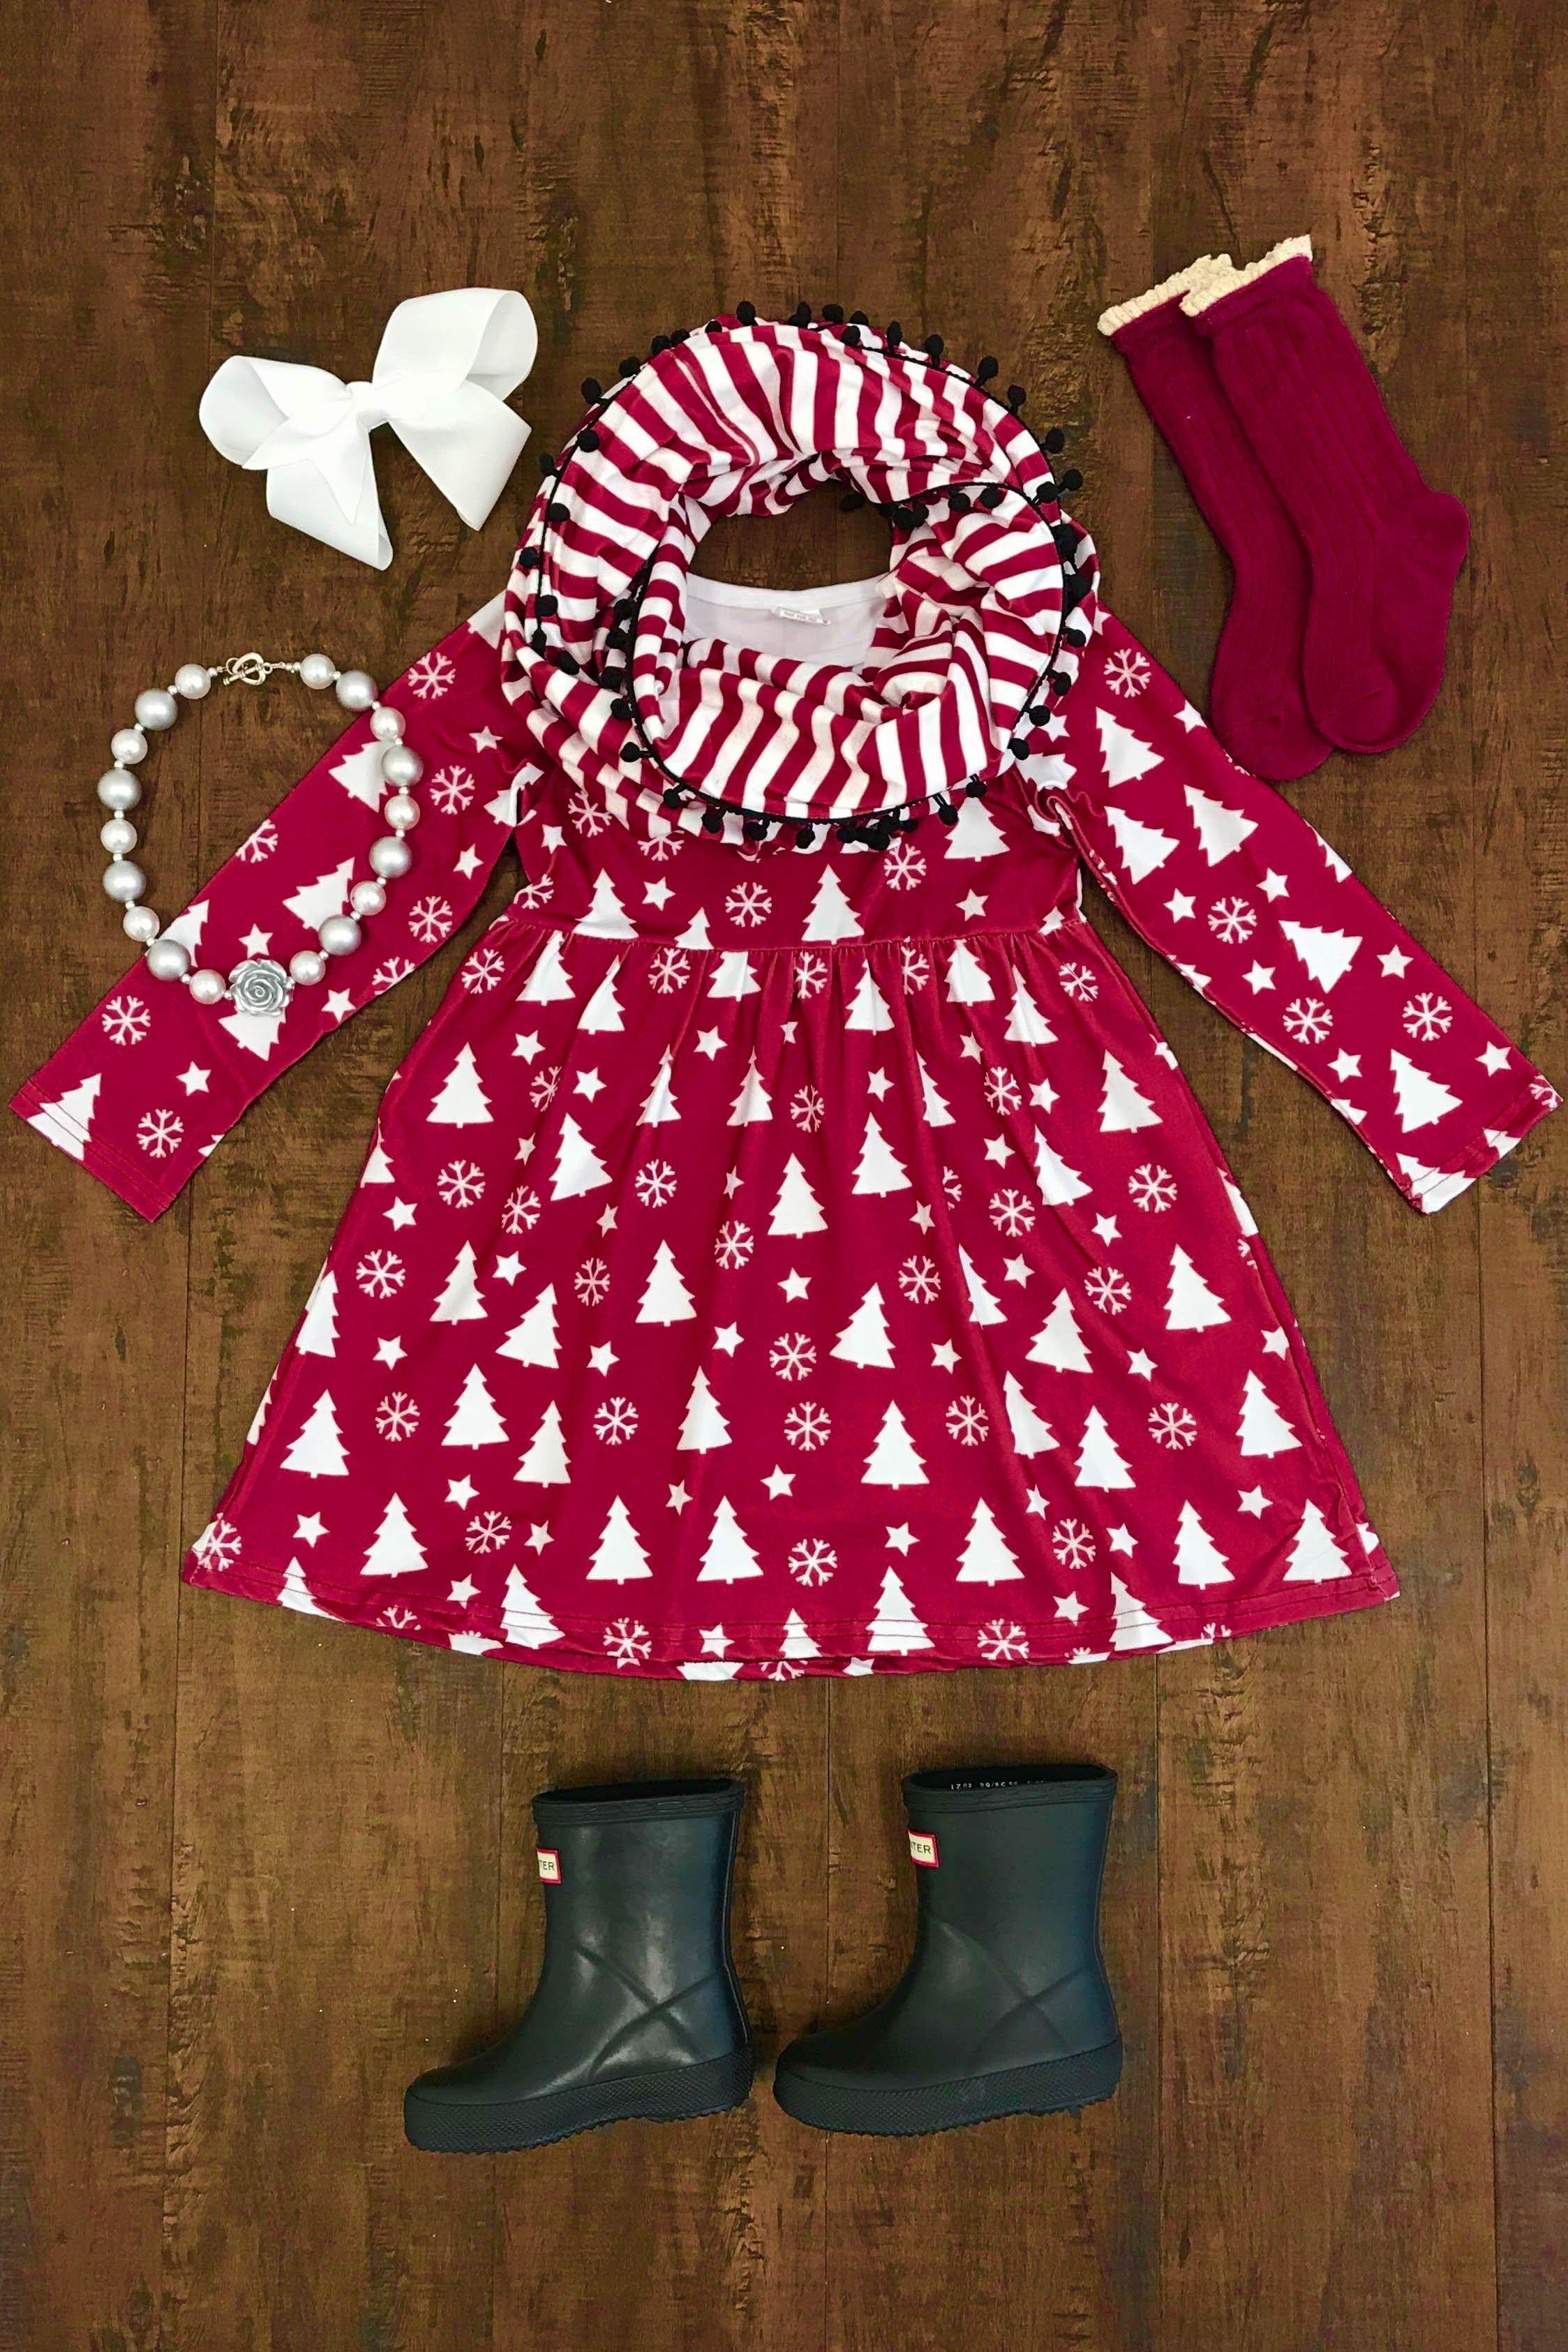 29dcf6dc8 Winter Wonderland Burgundy Dress | sewing inspiration | Dresses ...